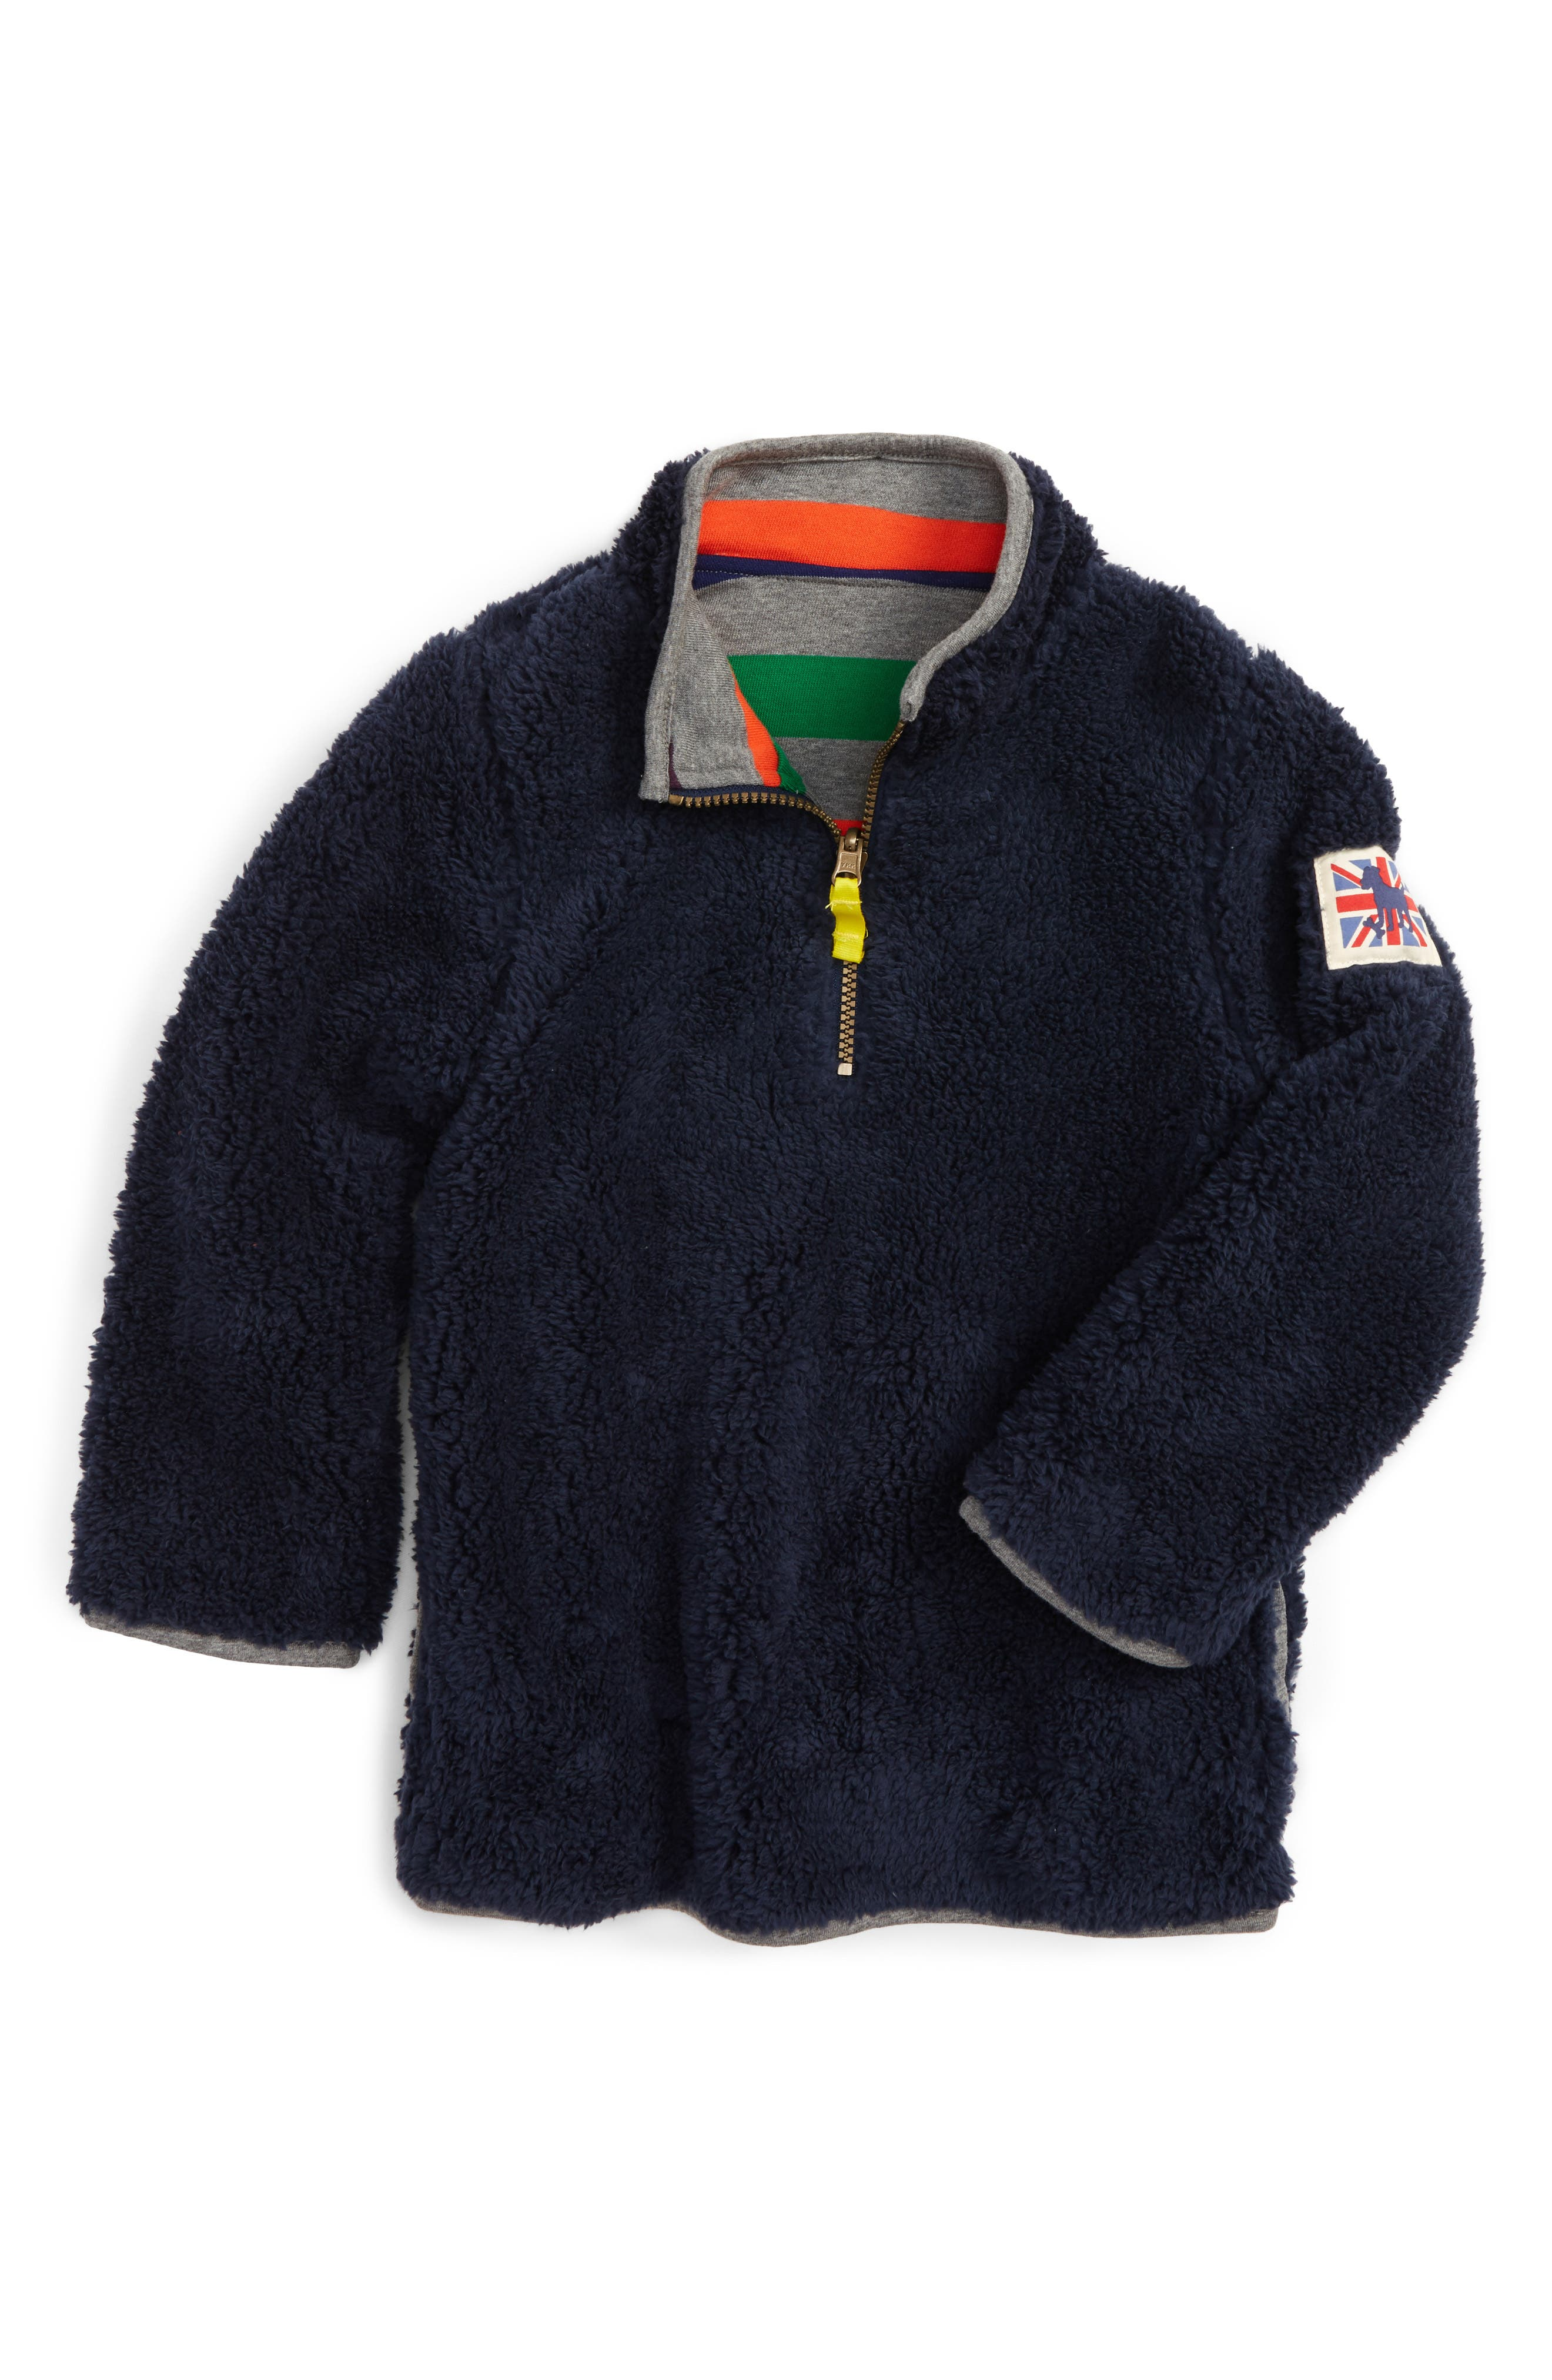 Alternate Image 1 Selected - Mini Boden Reversible Quarter Zip Sweatshirt (Toddler Boys, Little Boys & Big Boys)